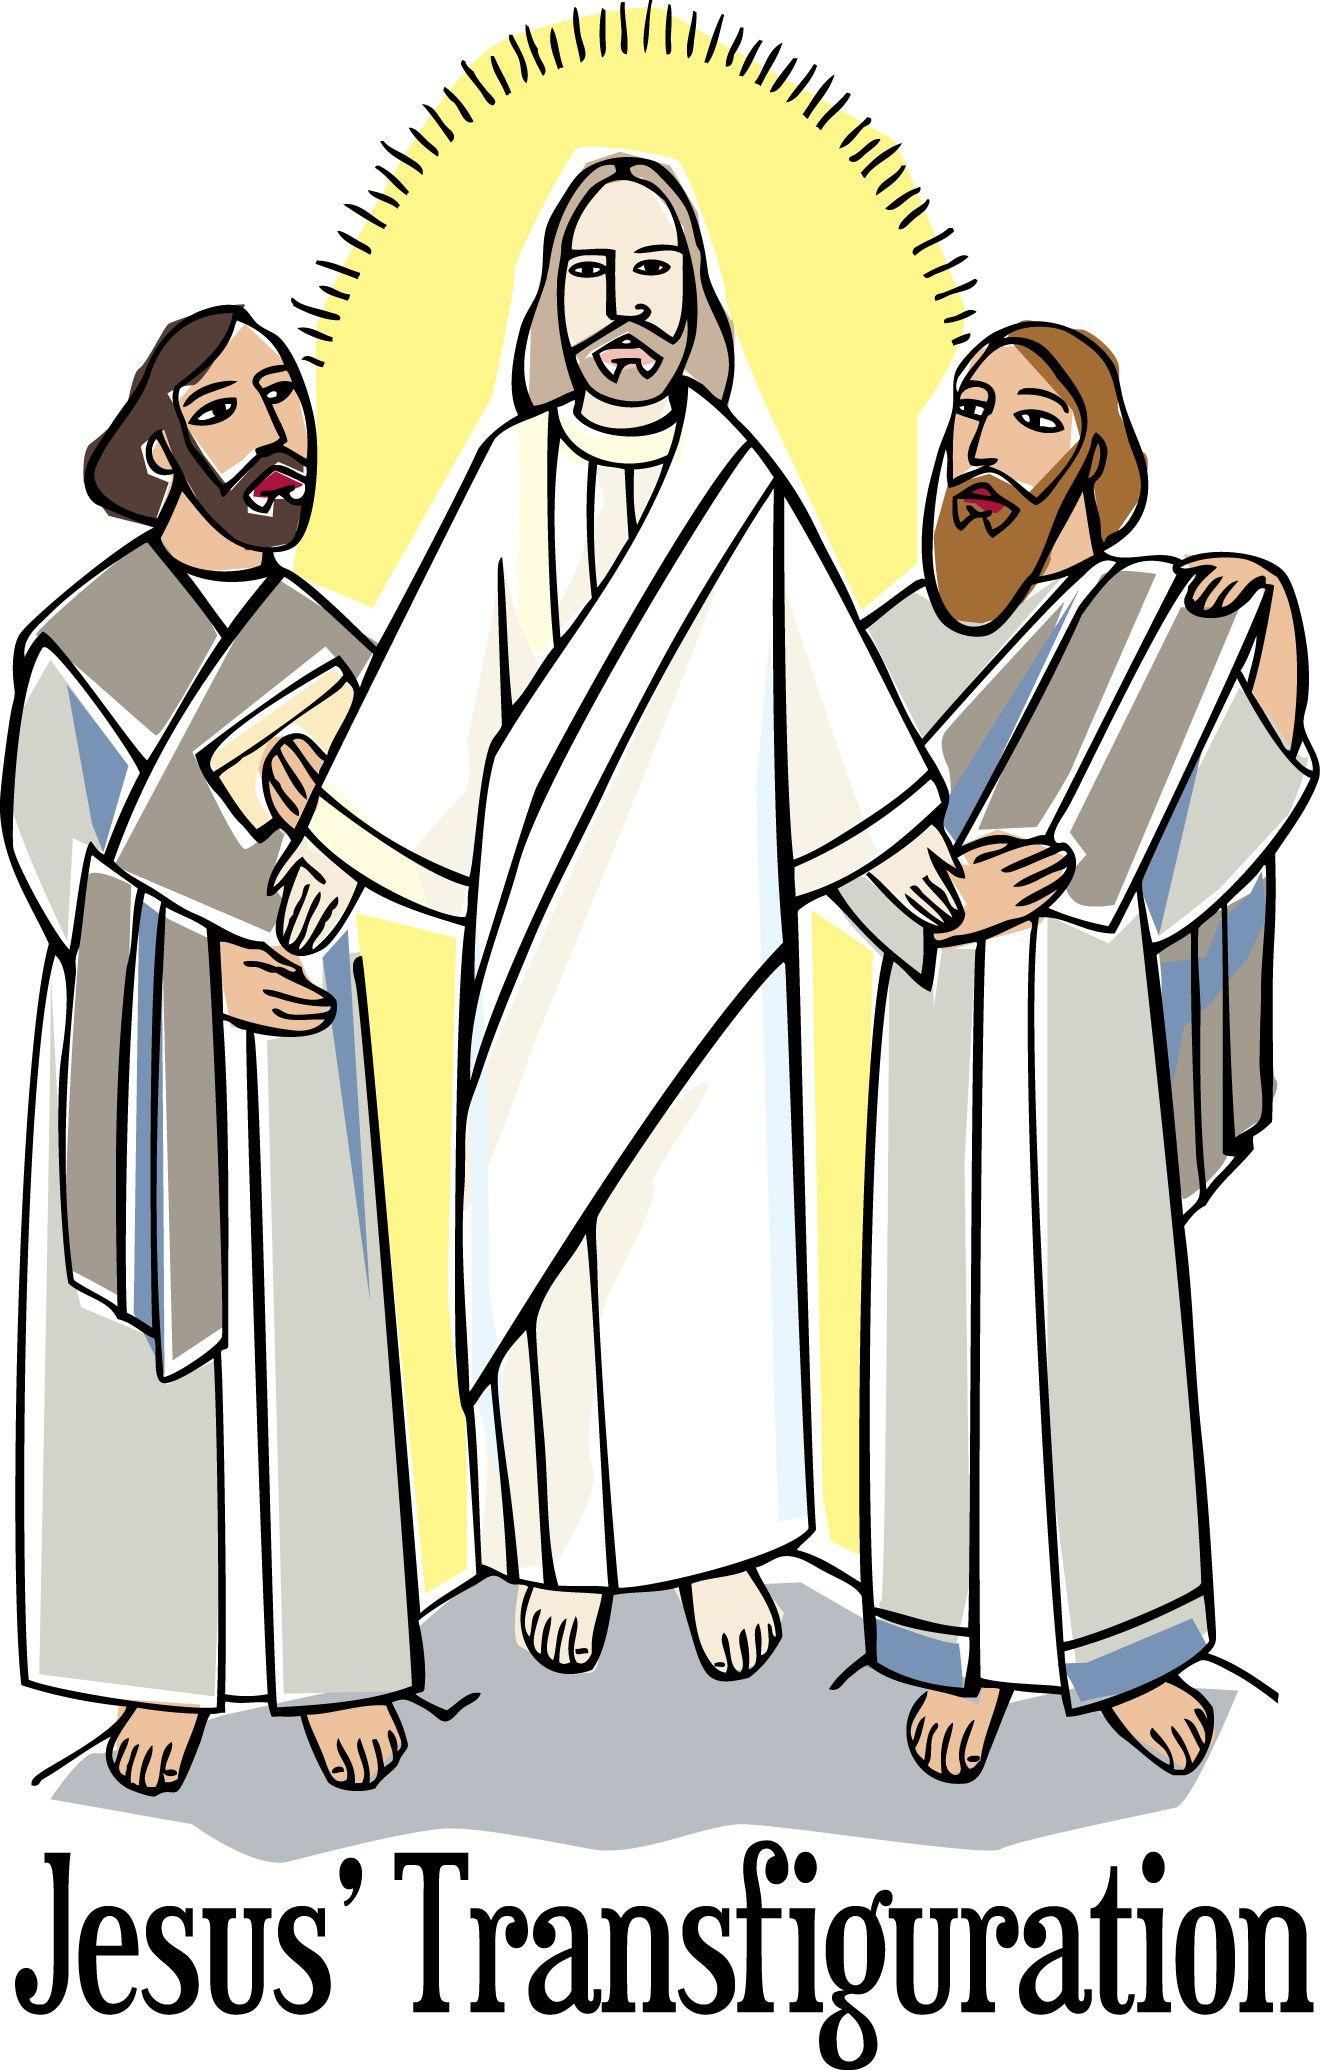 transfiguration of jesus children s church crafts children church church banners sunday school [ 1320 x 2070 Pixel ]